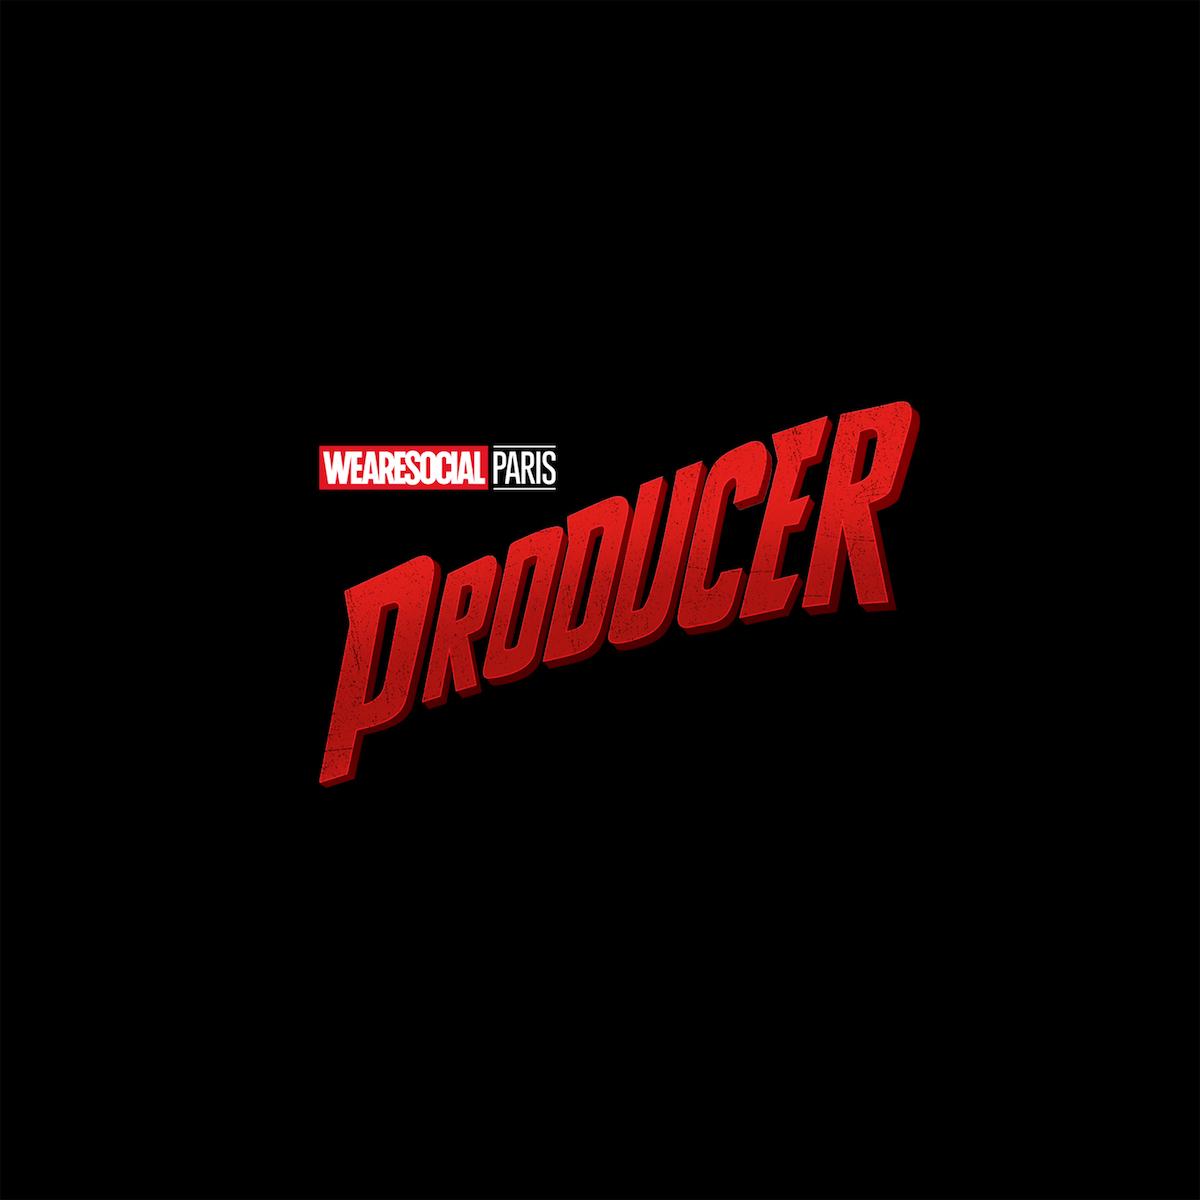 Superhero Logos for creative agency job titles - Producer / Daredevil